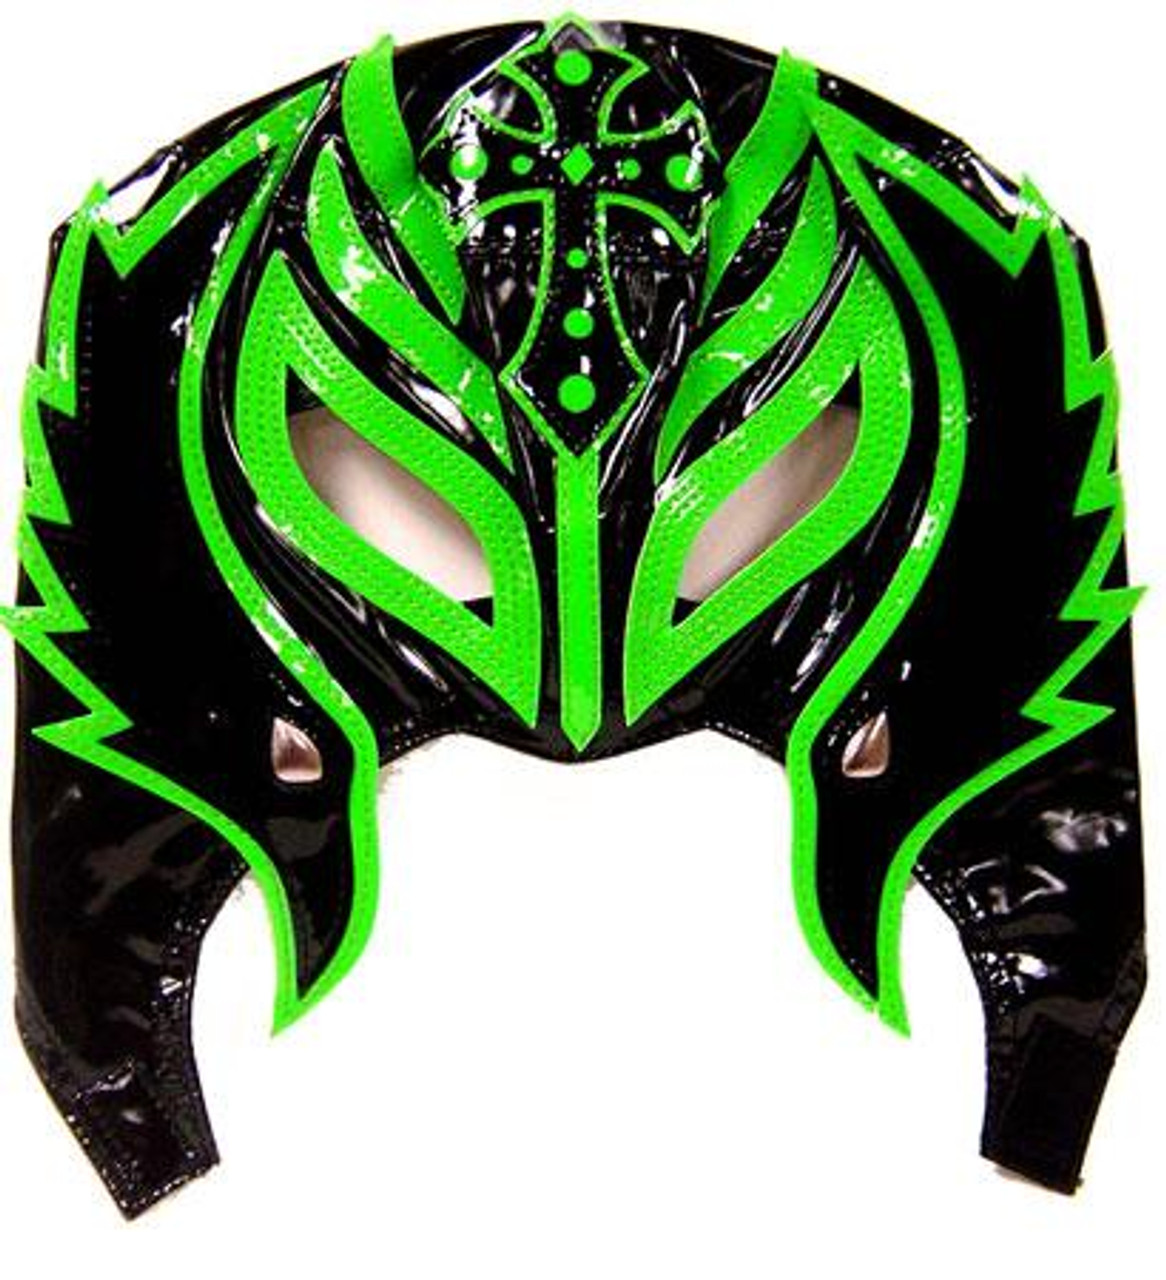 WWE Wrestling Rey Mysterio Replica Mask [Youth, Green & Black]